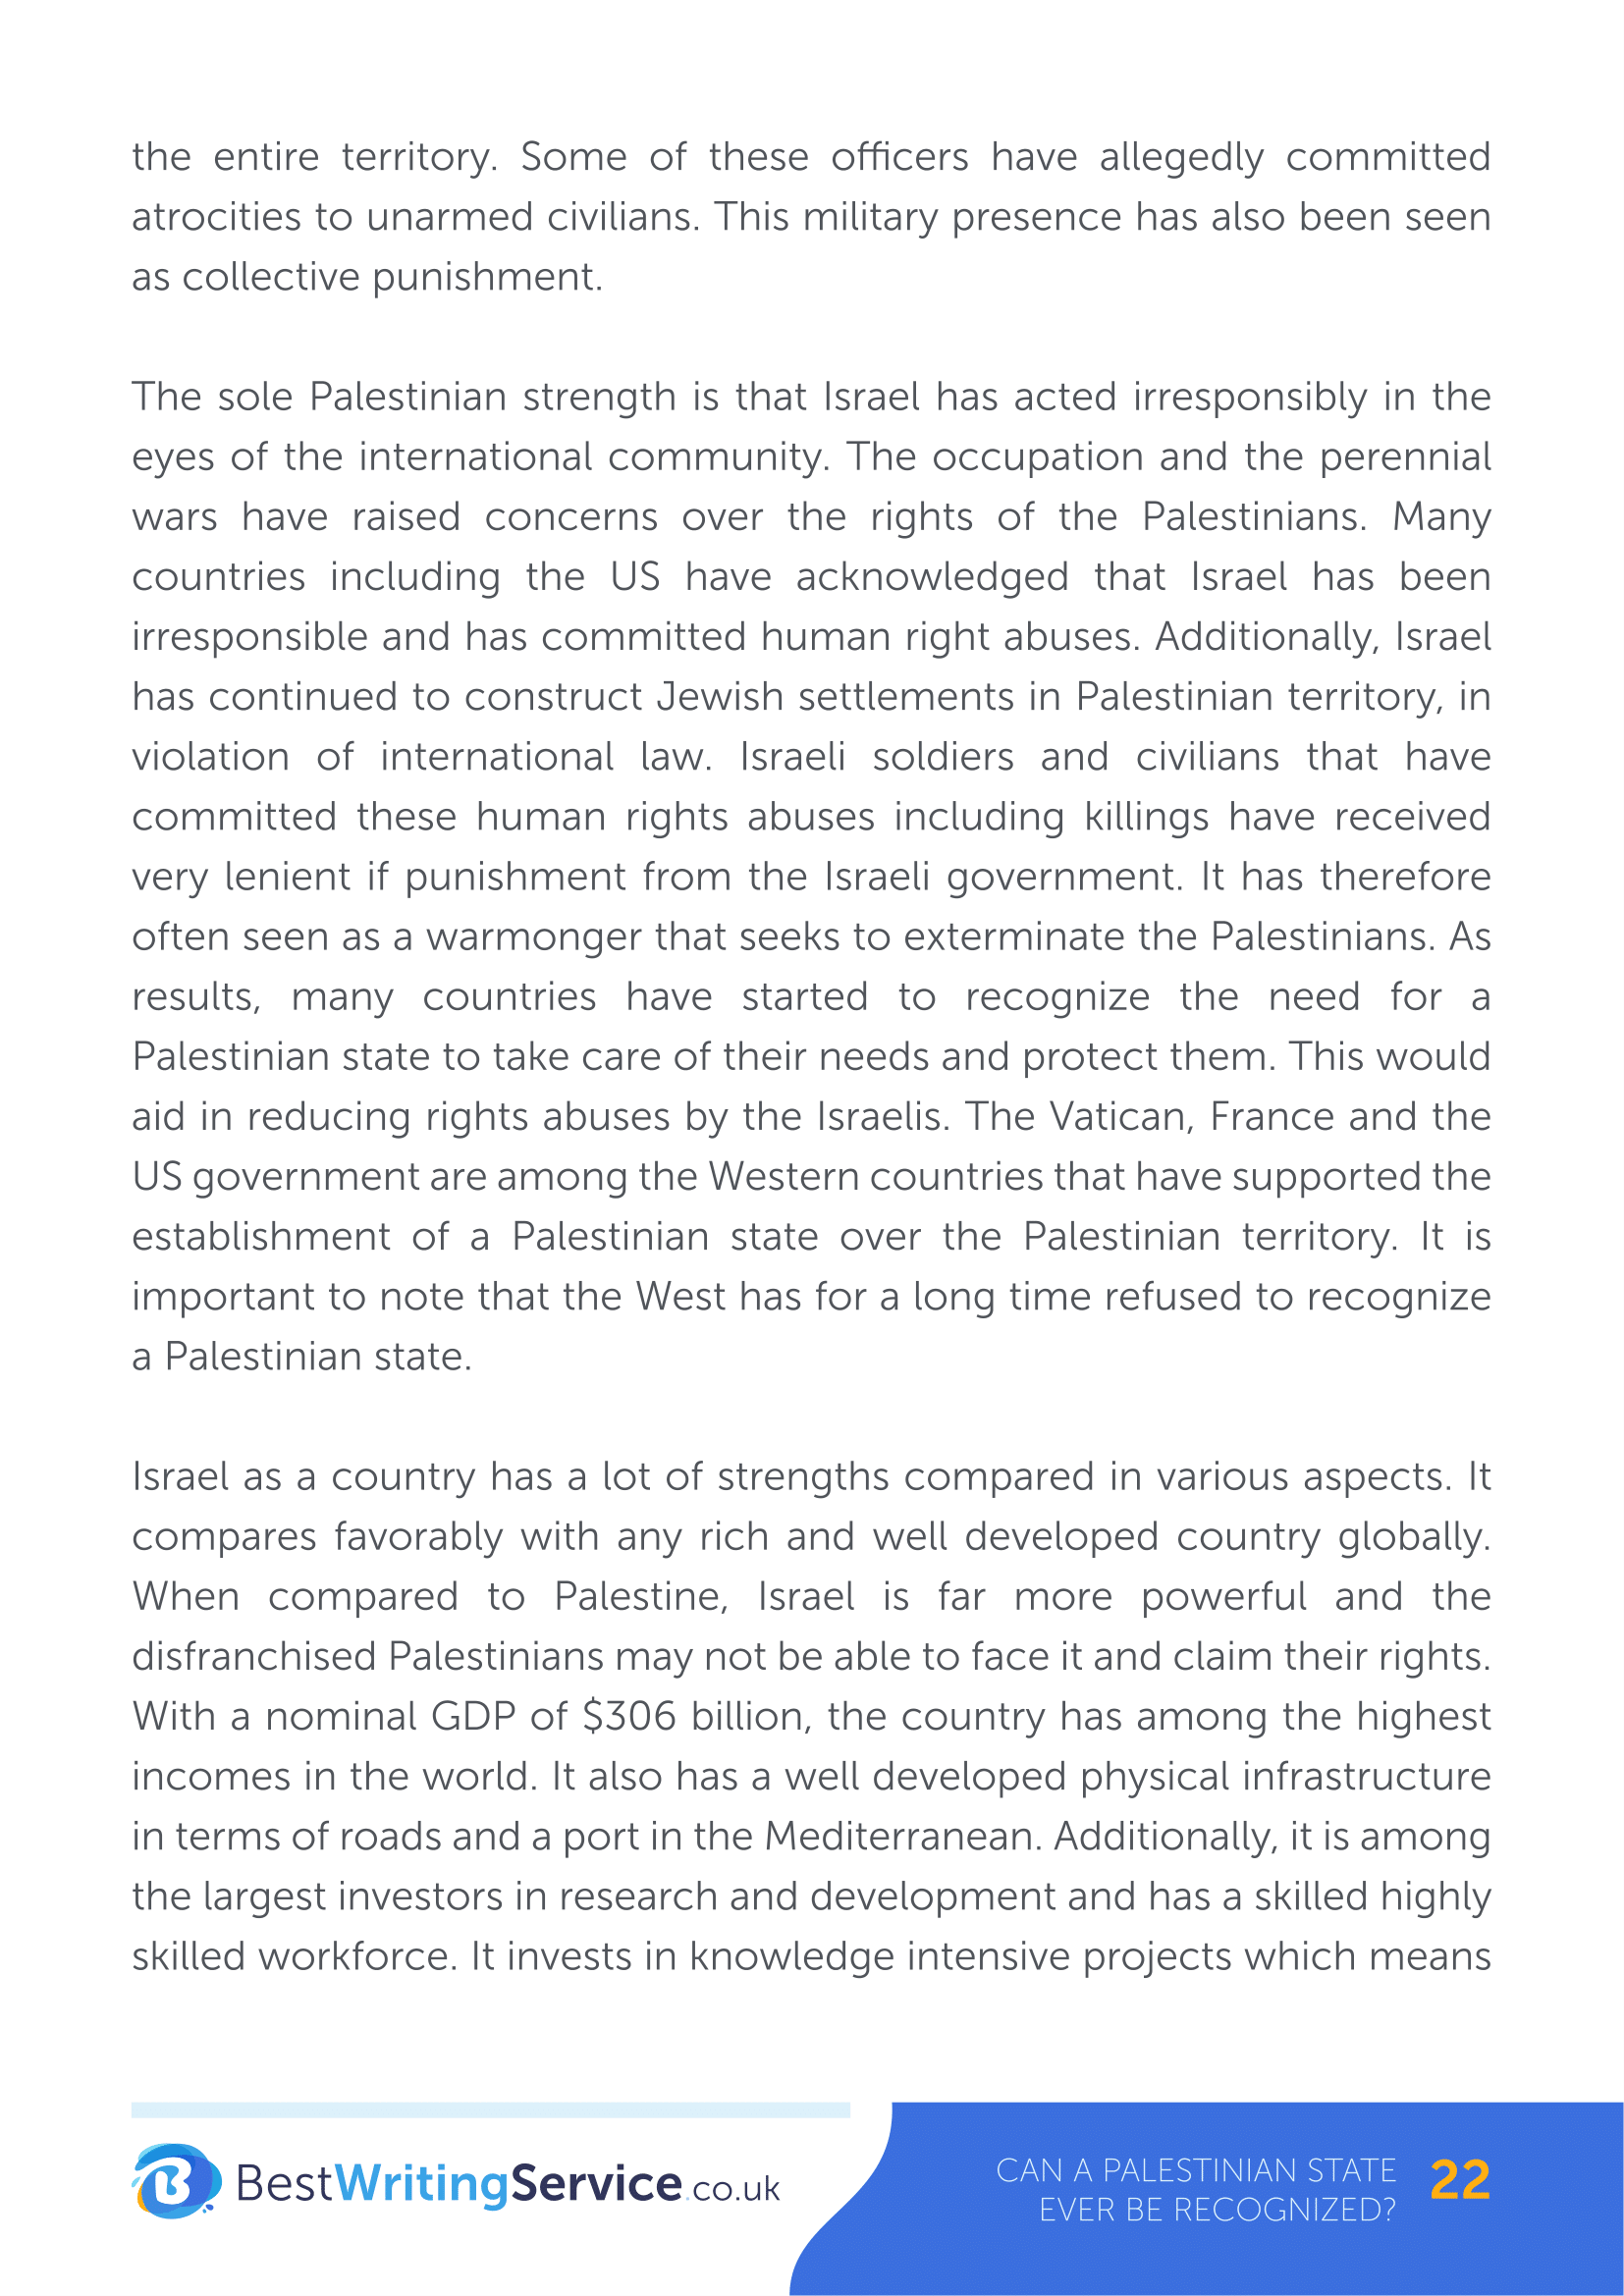 Essay on criminalisation of politics